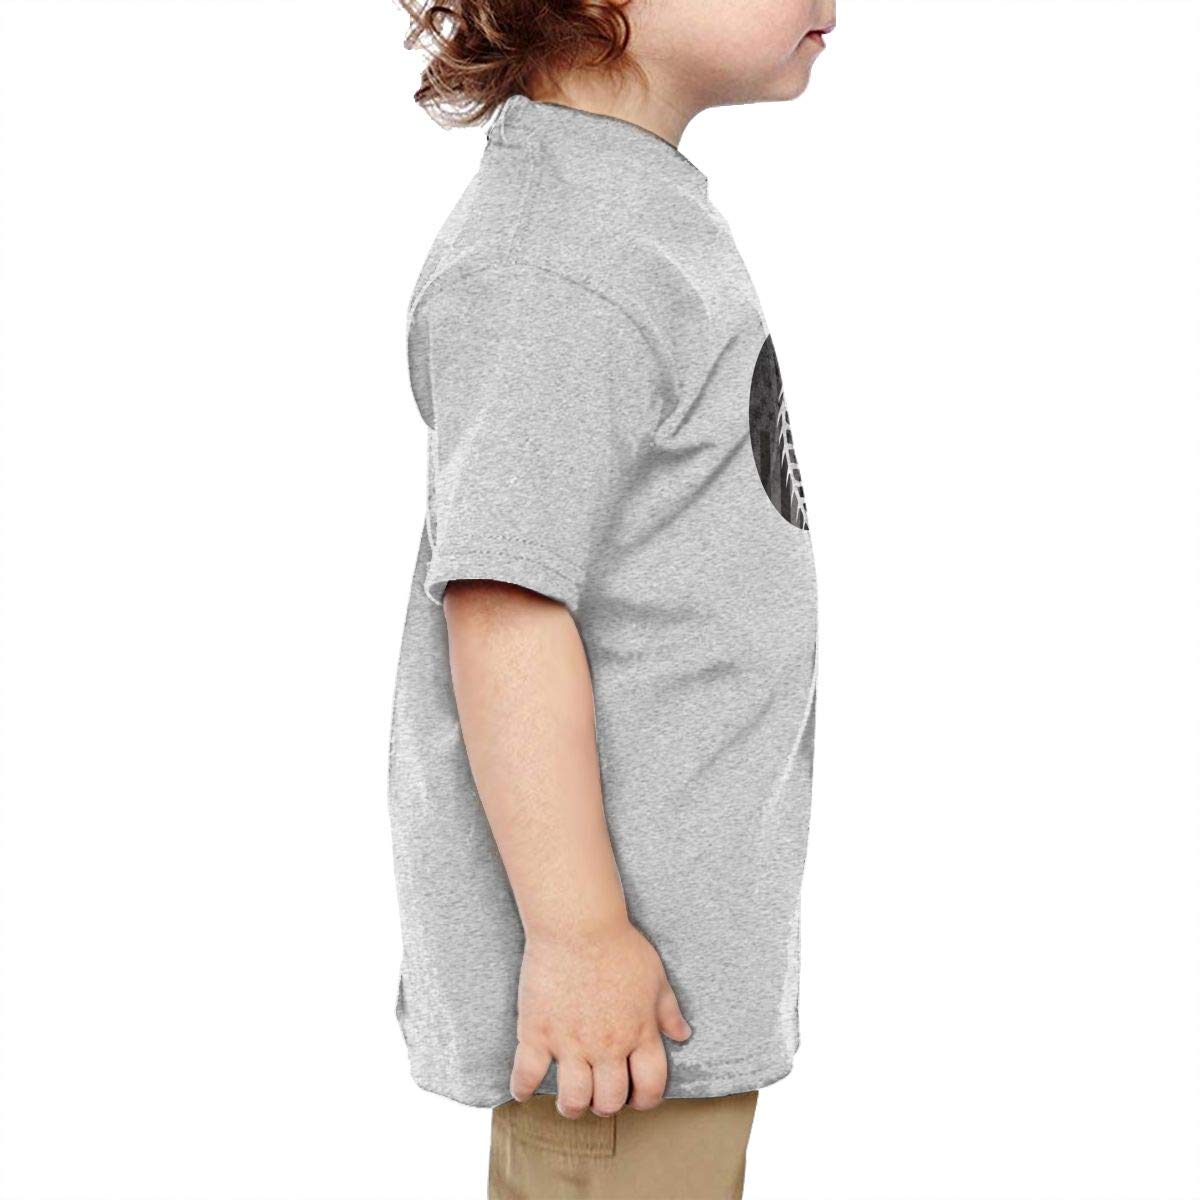 Chunmmmmm Thin Blue Line Softball Lace Baby Boy Short Sleeve Round Neck Cotton T-Shirts